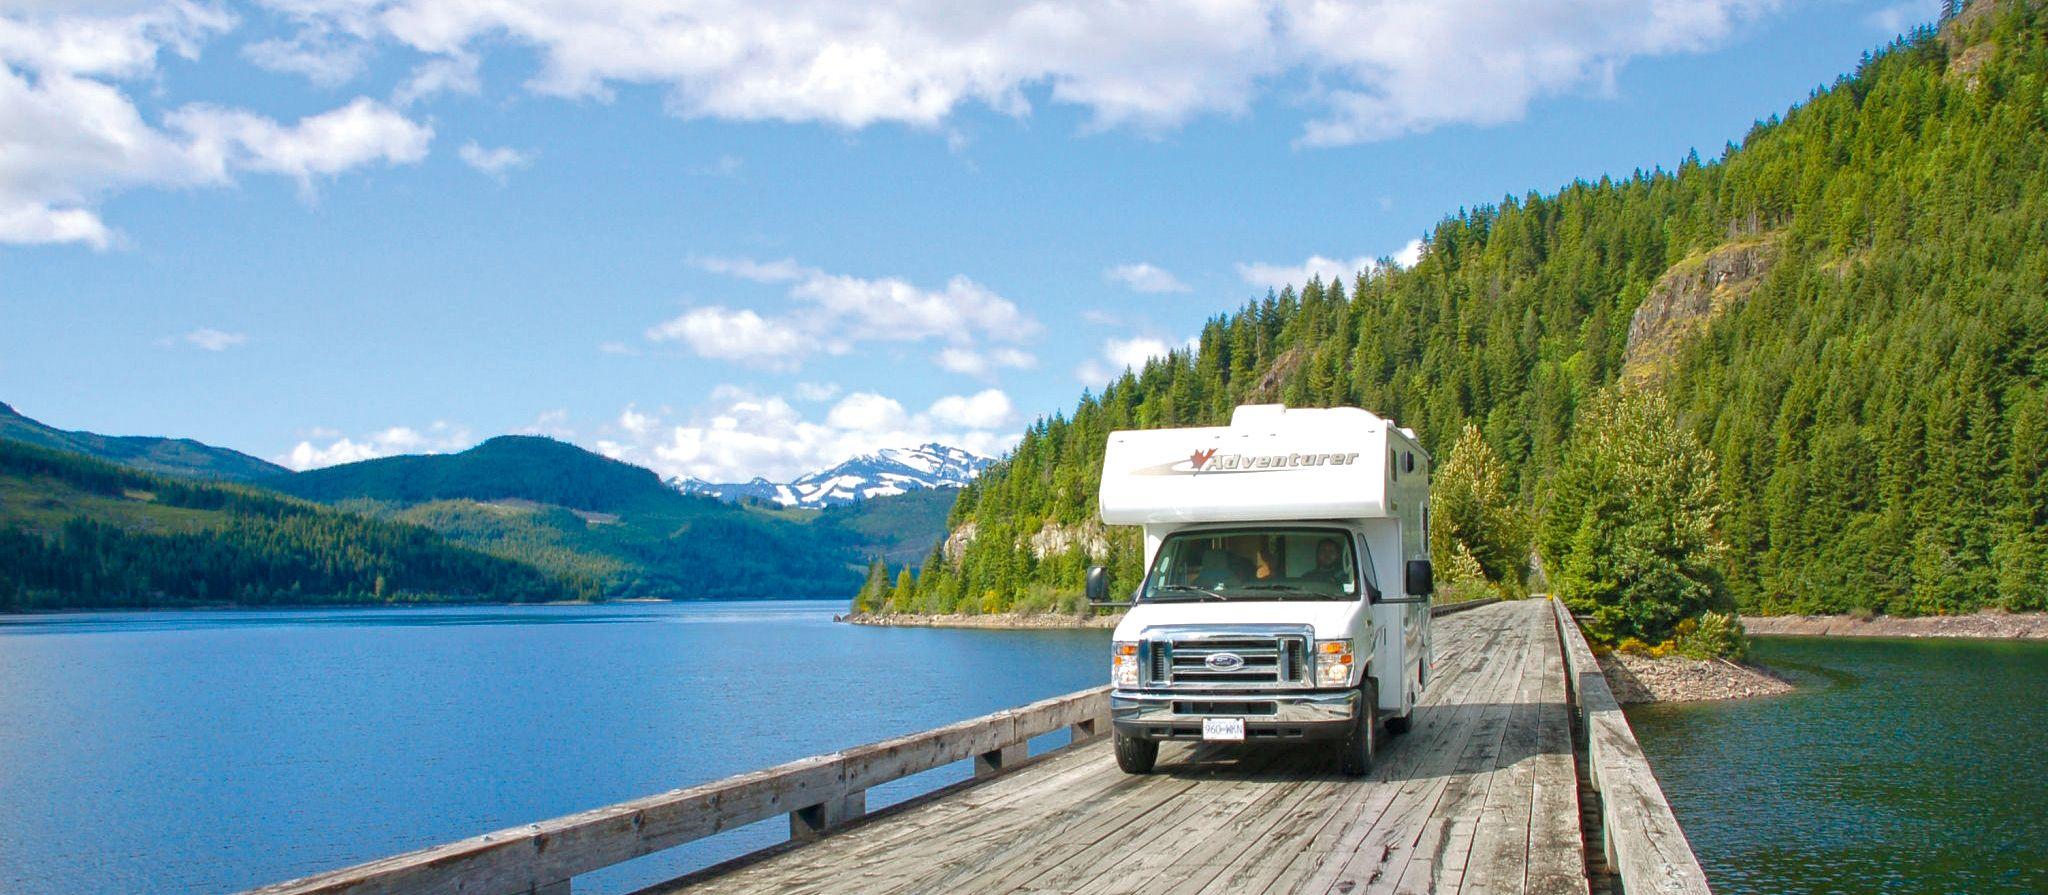 Camper in spektakulärer Landschaft